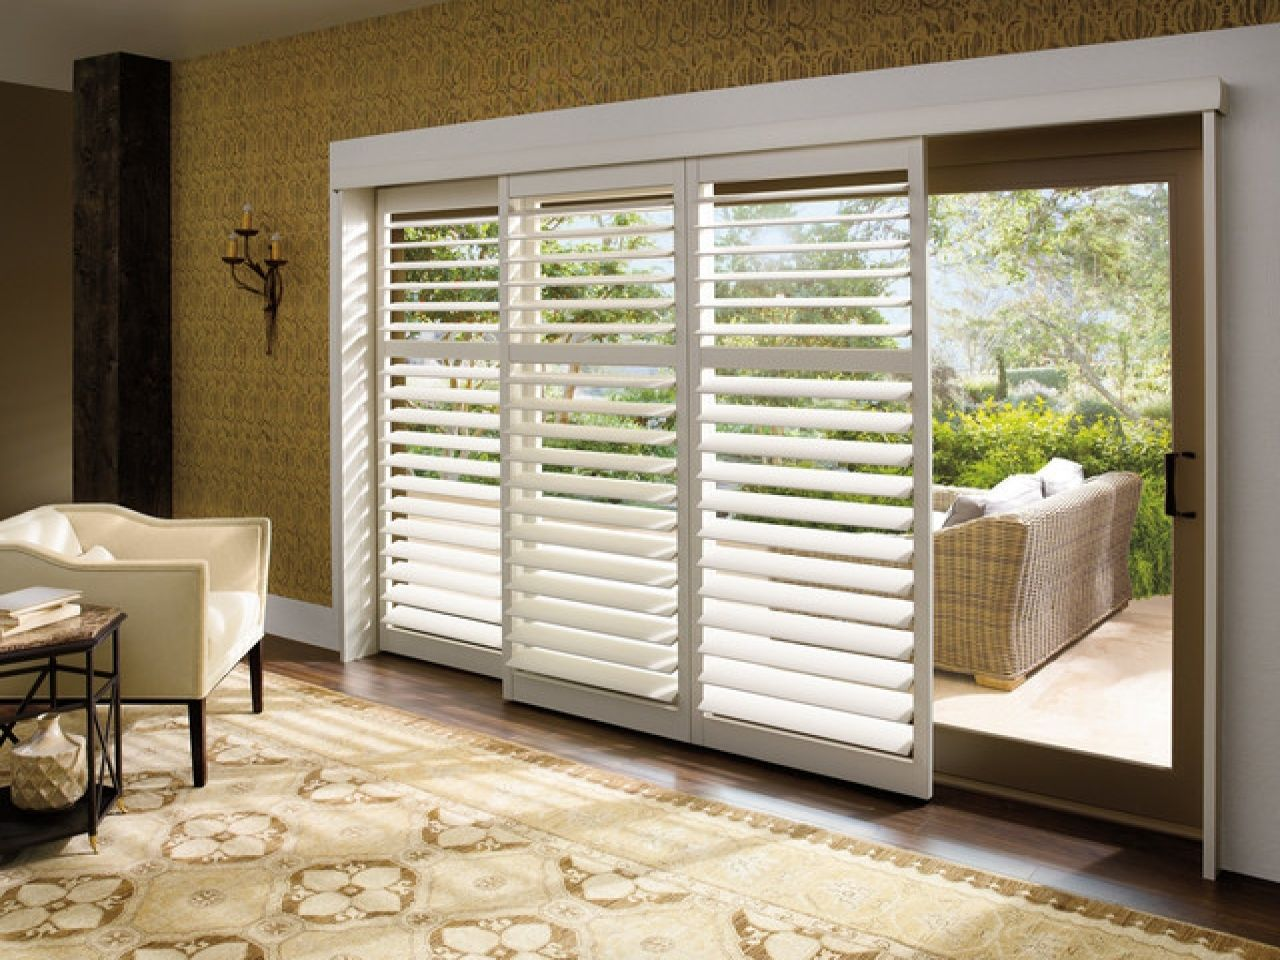 Window coverings wood  window covering for patio doors  bukuweb  pinterest